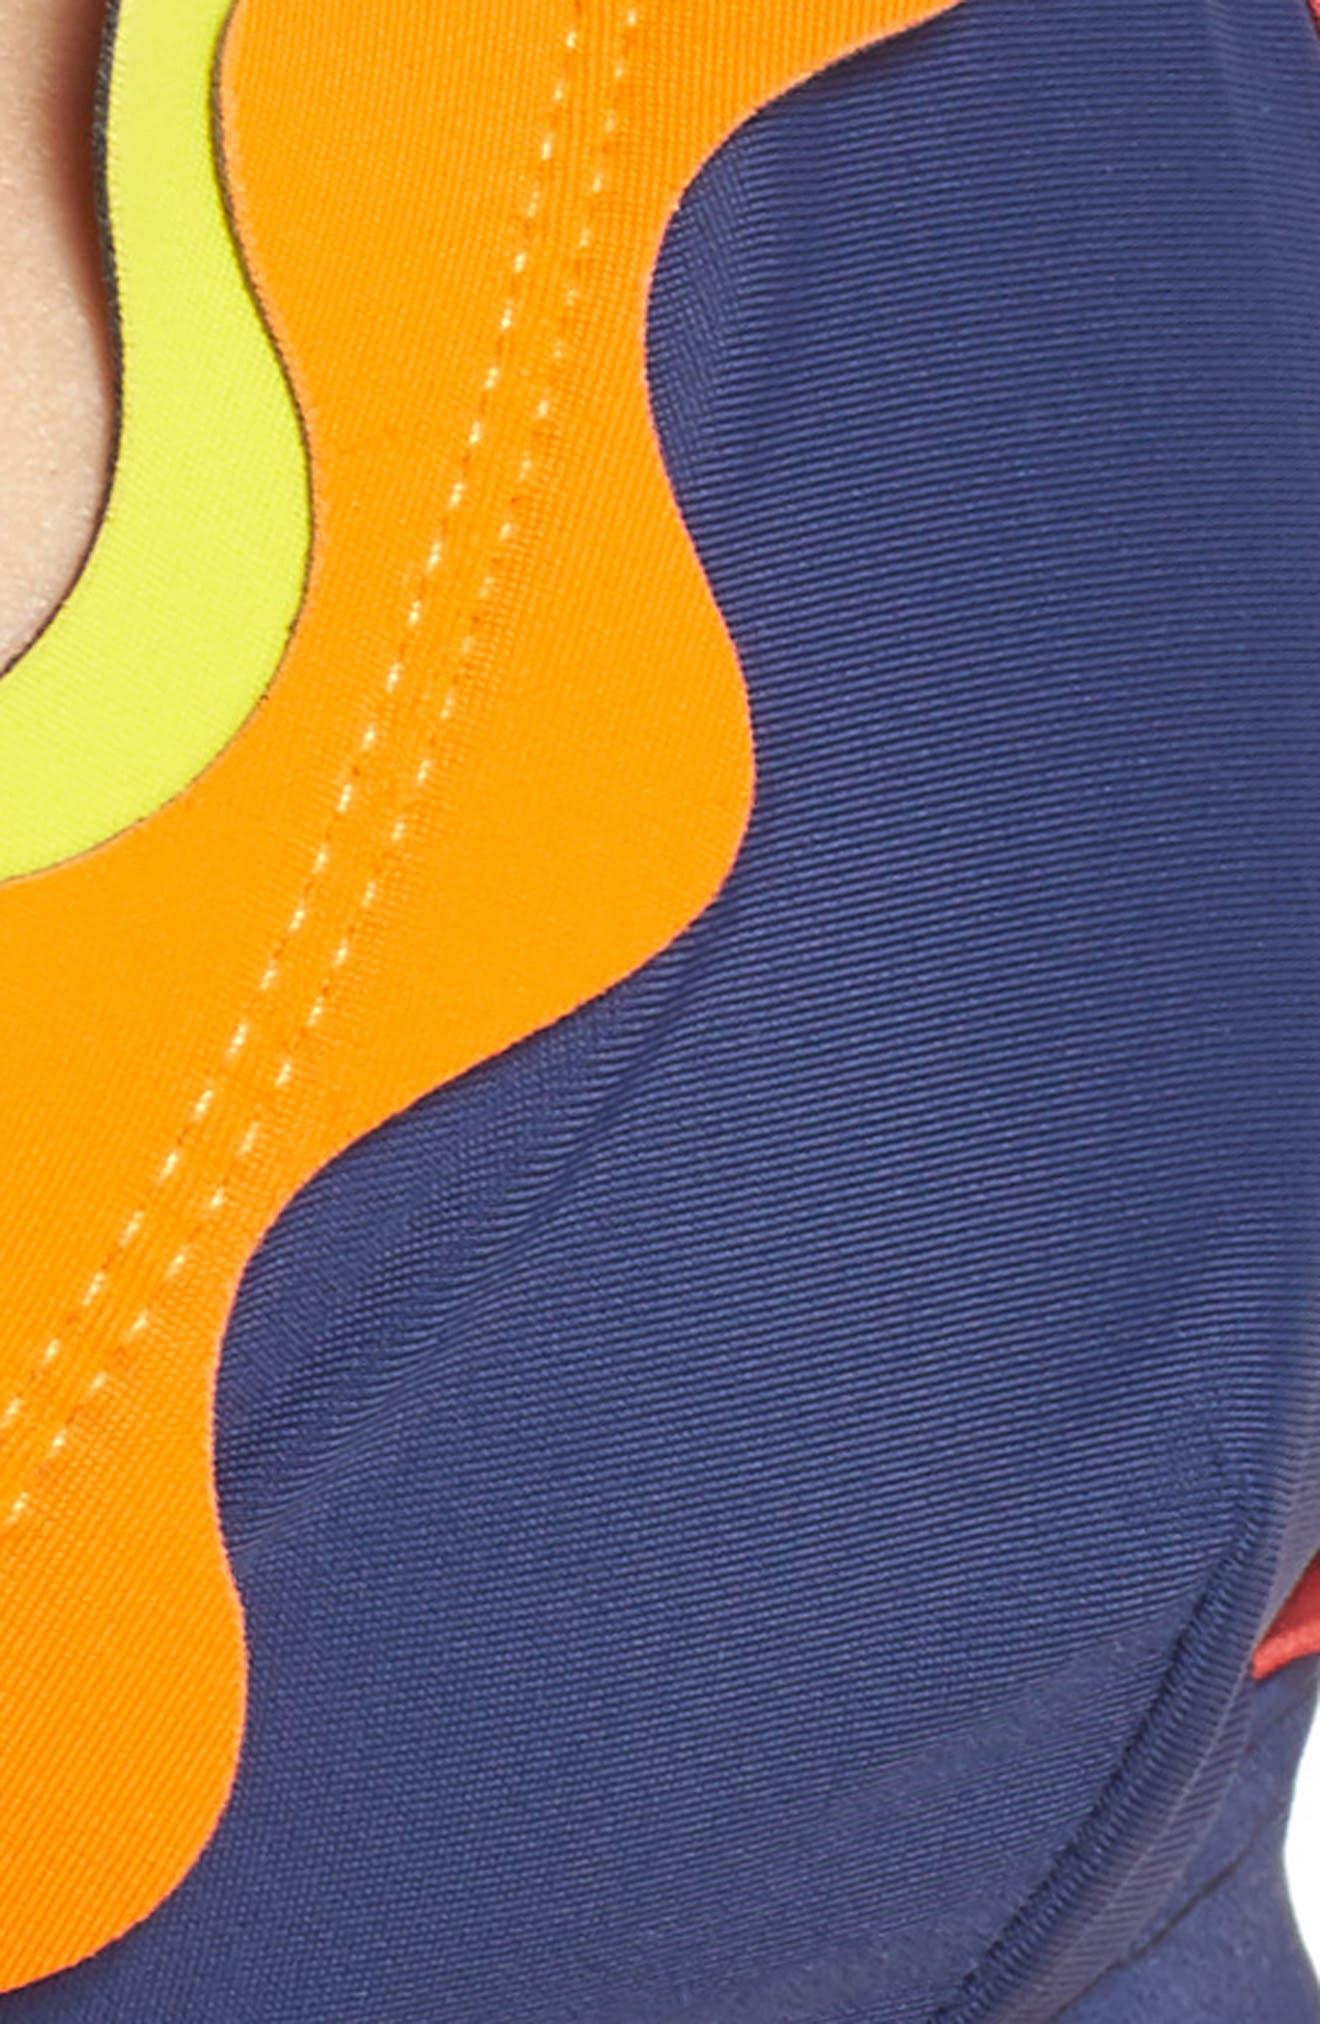 Oh My Bikini Top,                             Alternate thumbnail 8, color,                             Navy